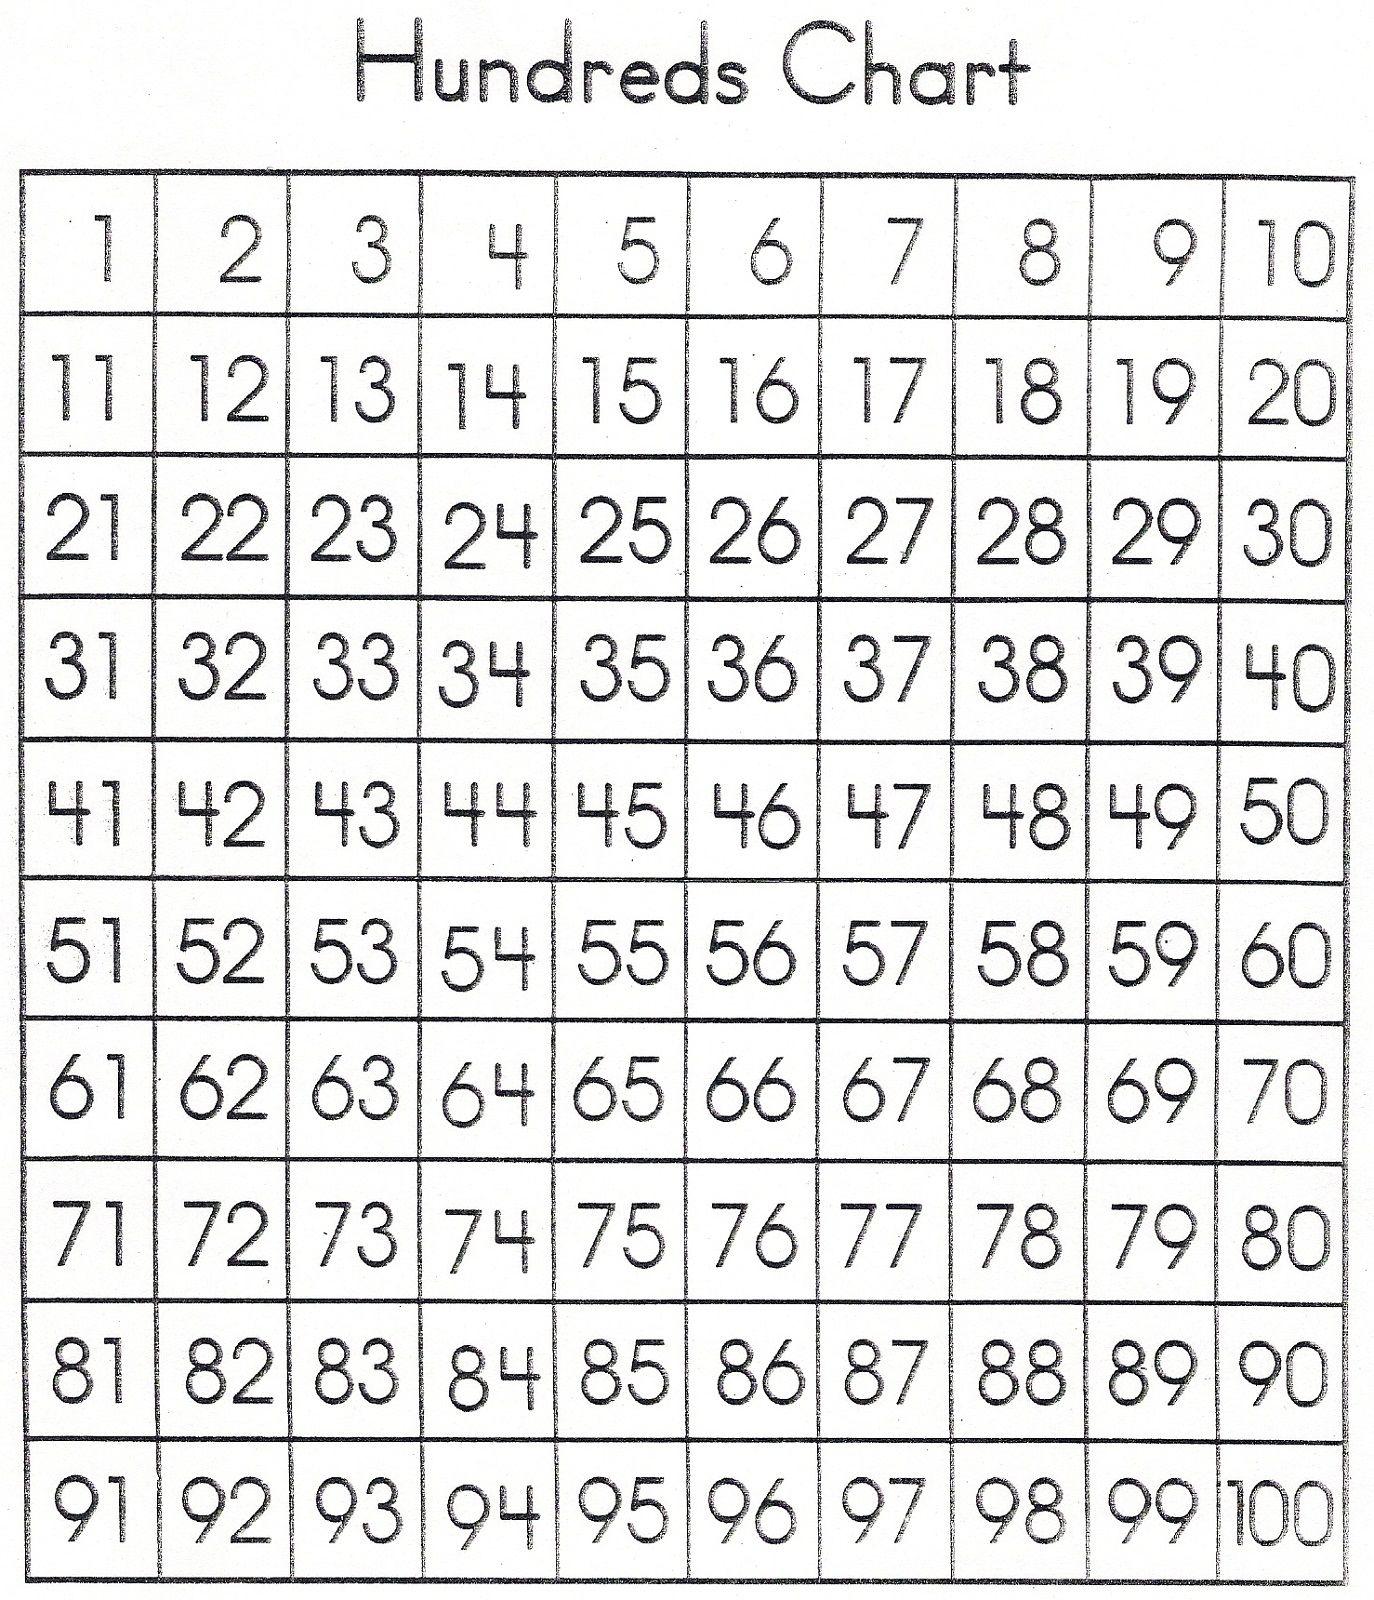 One Hundred Chart Worksheet | Kids Activities